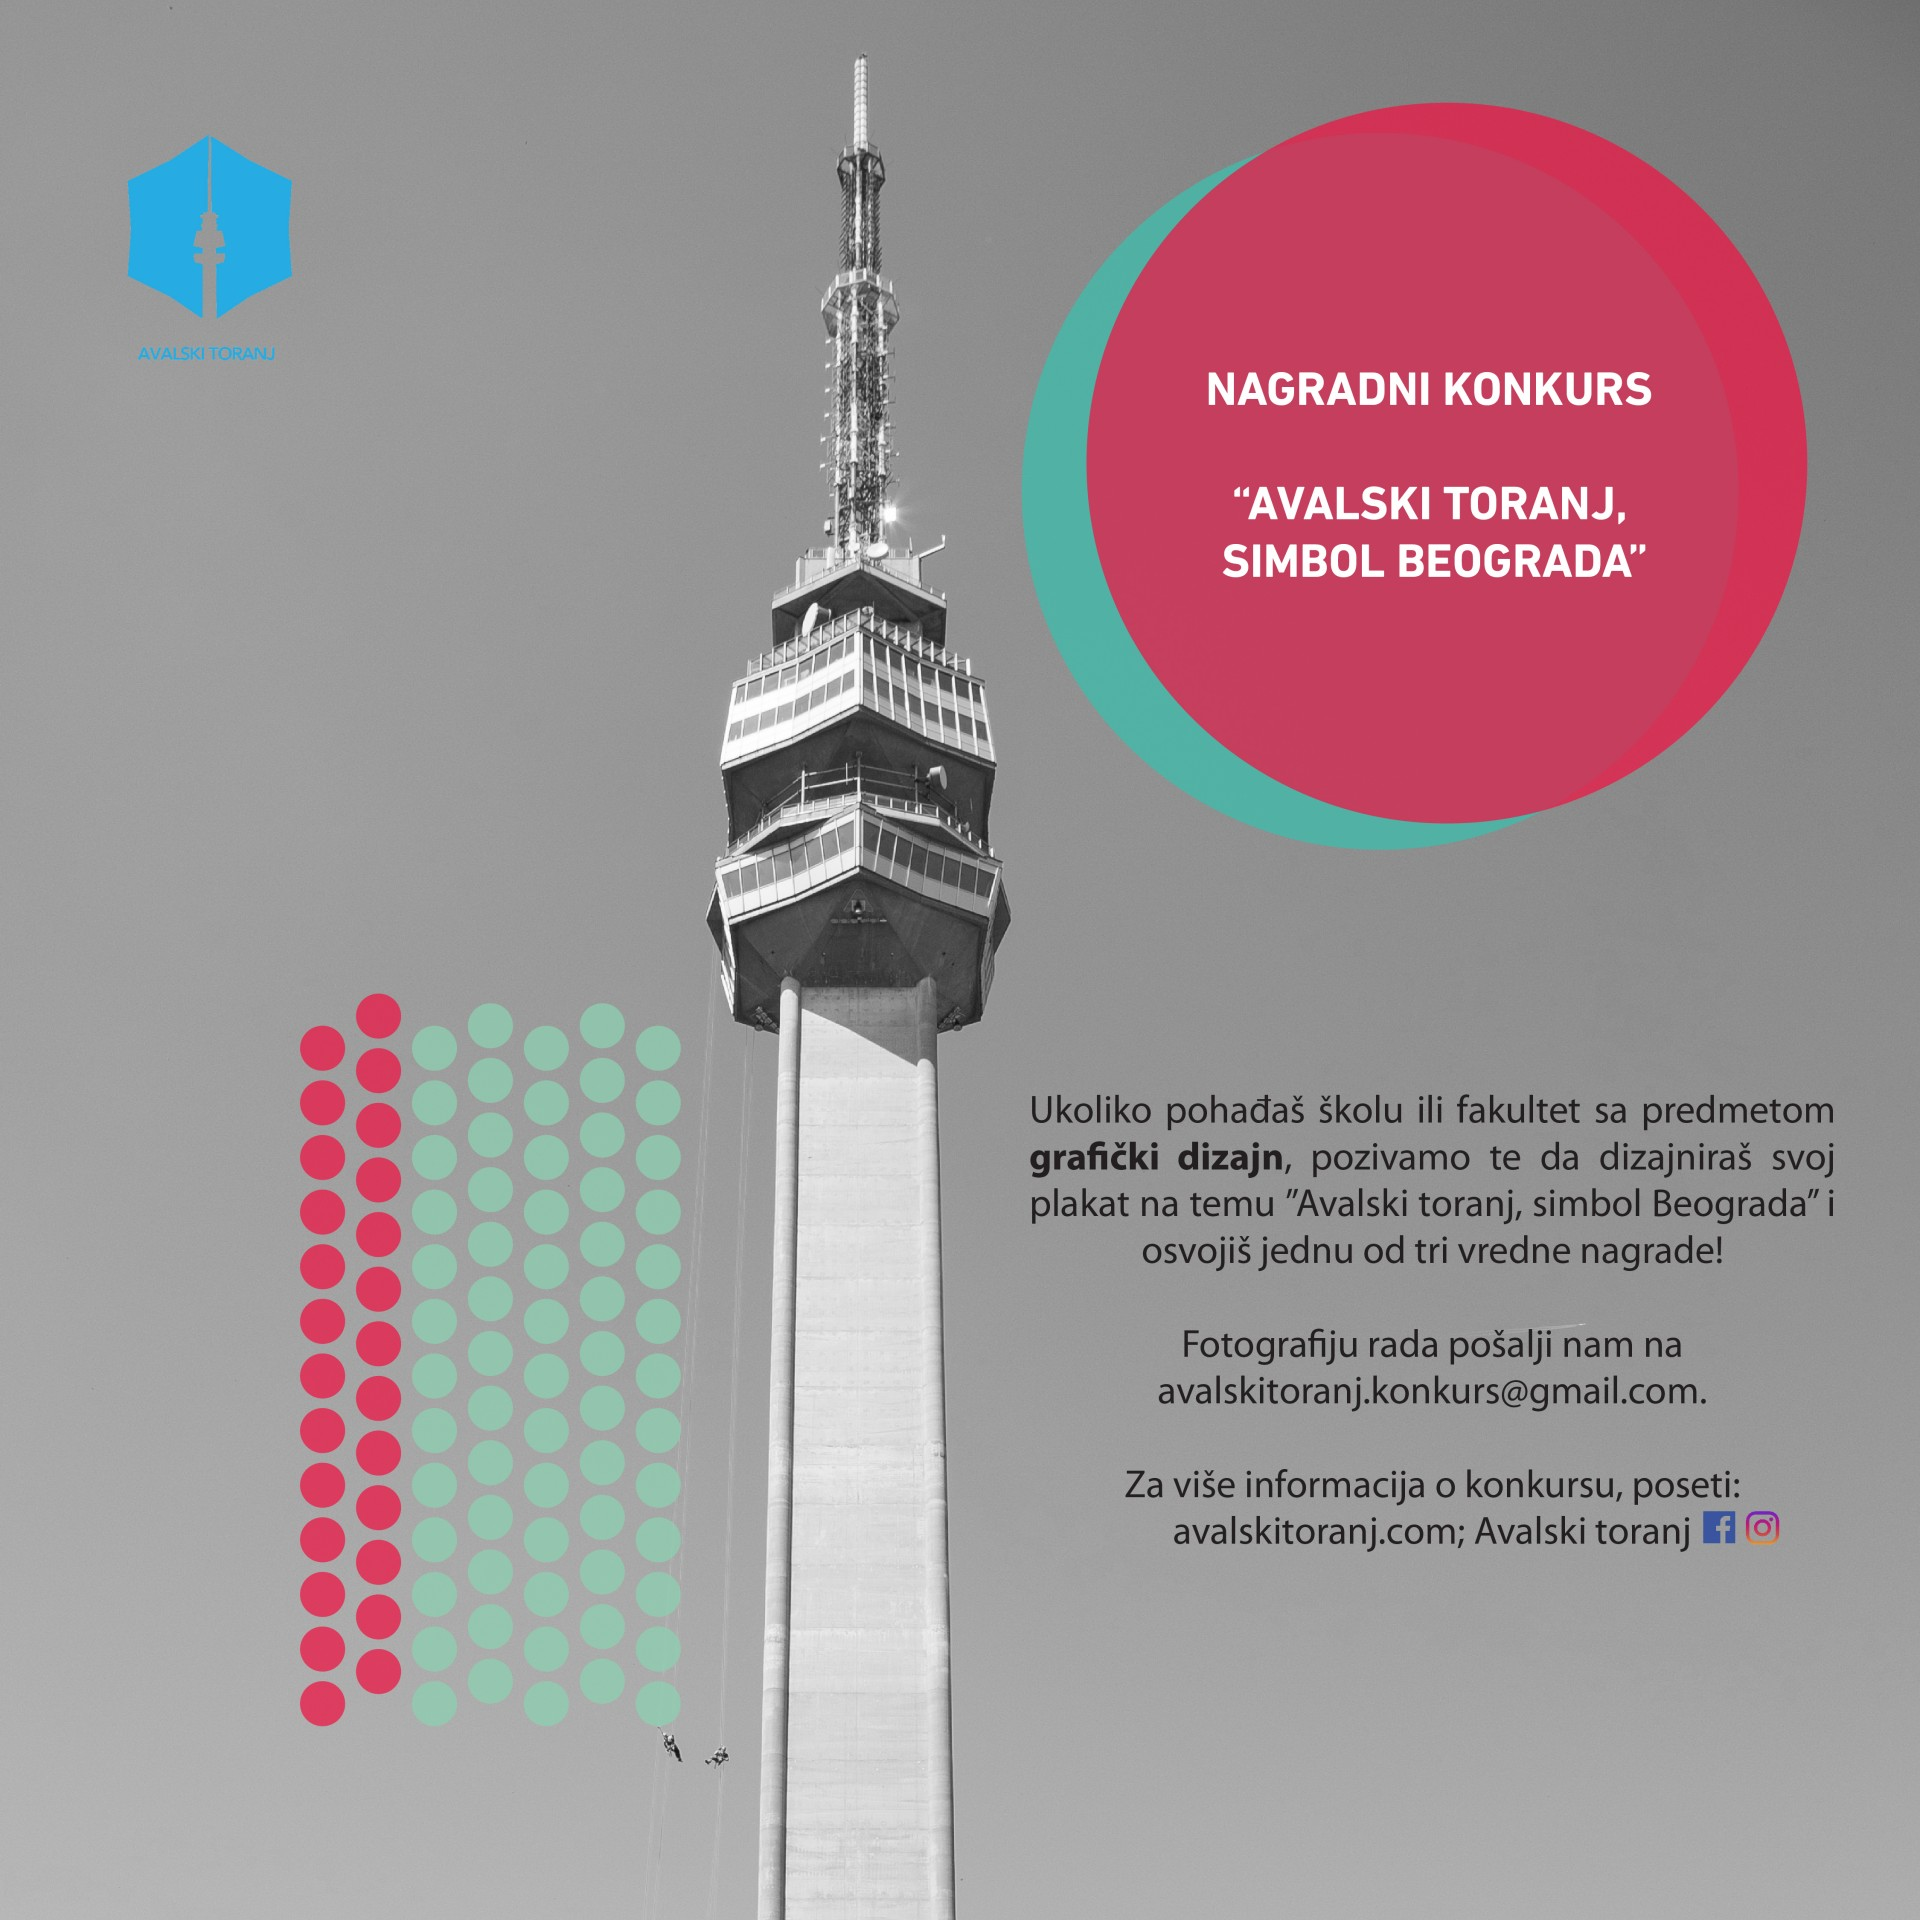 Наградни конкурс ''Авалски торањ, симбол Београда''